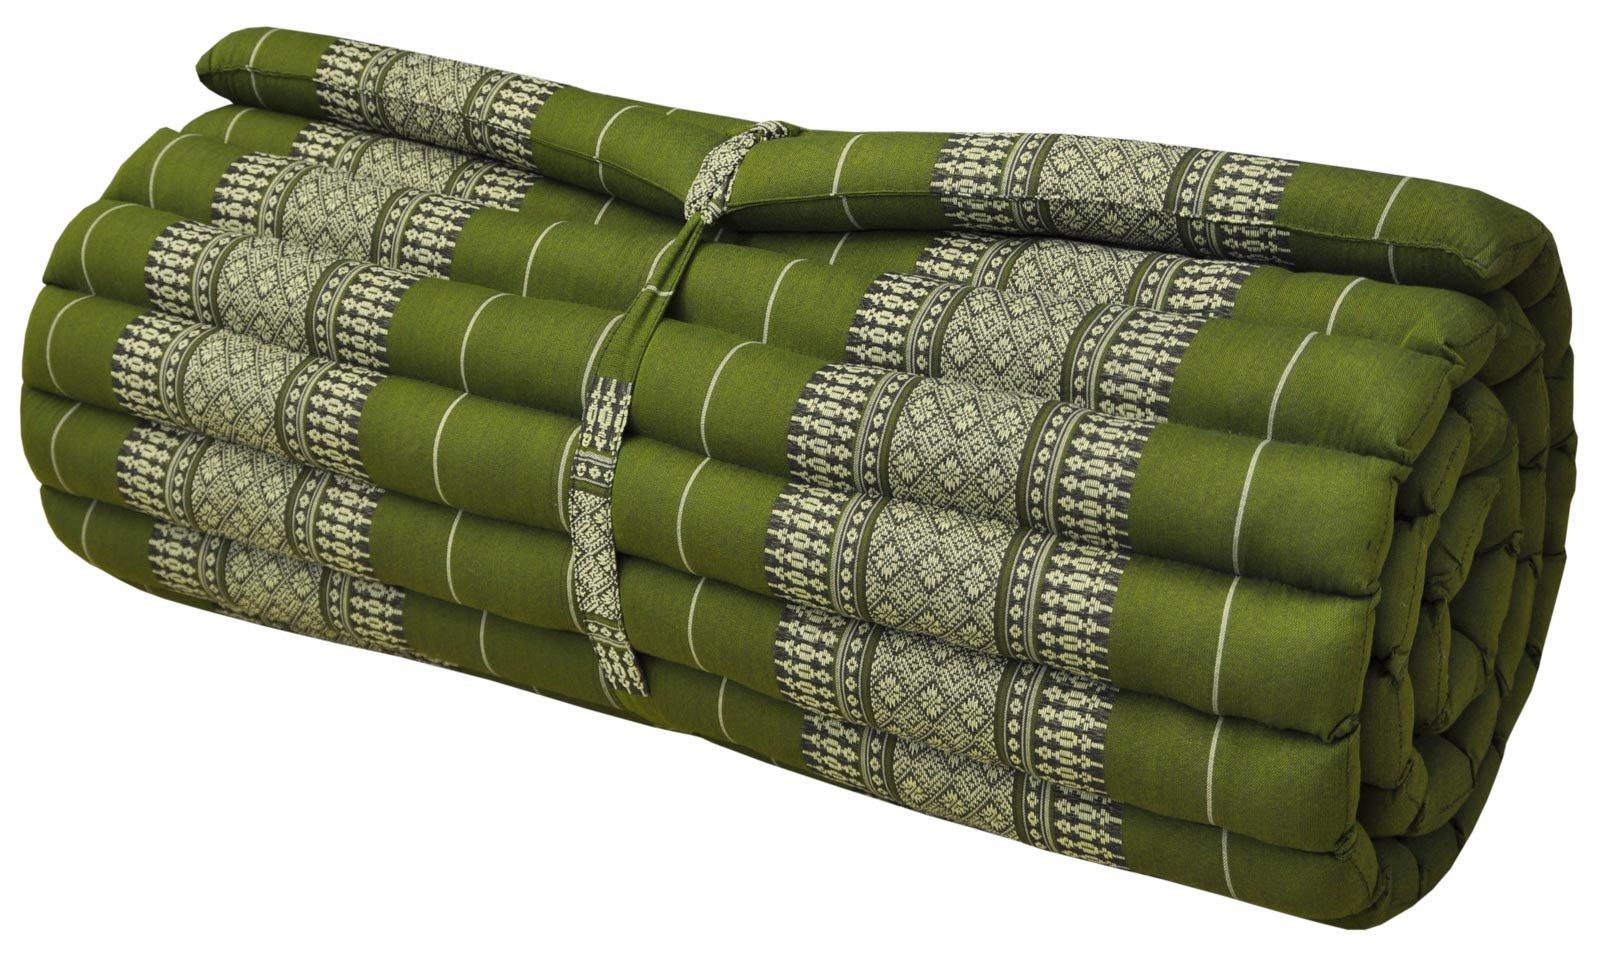 Thai Mattress Roll Up, 21.65 * 63 * 3inch, Kapok, Green by Thai Mattress